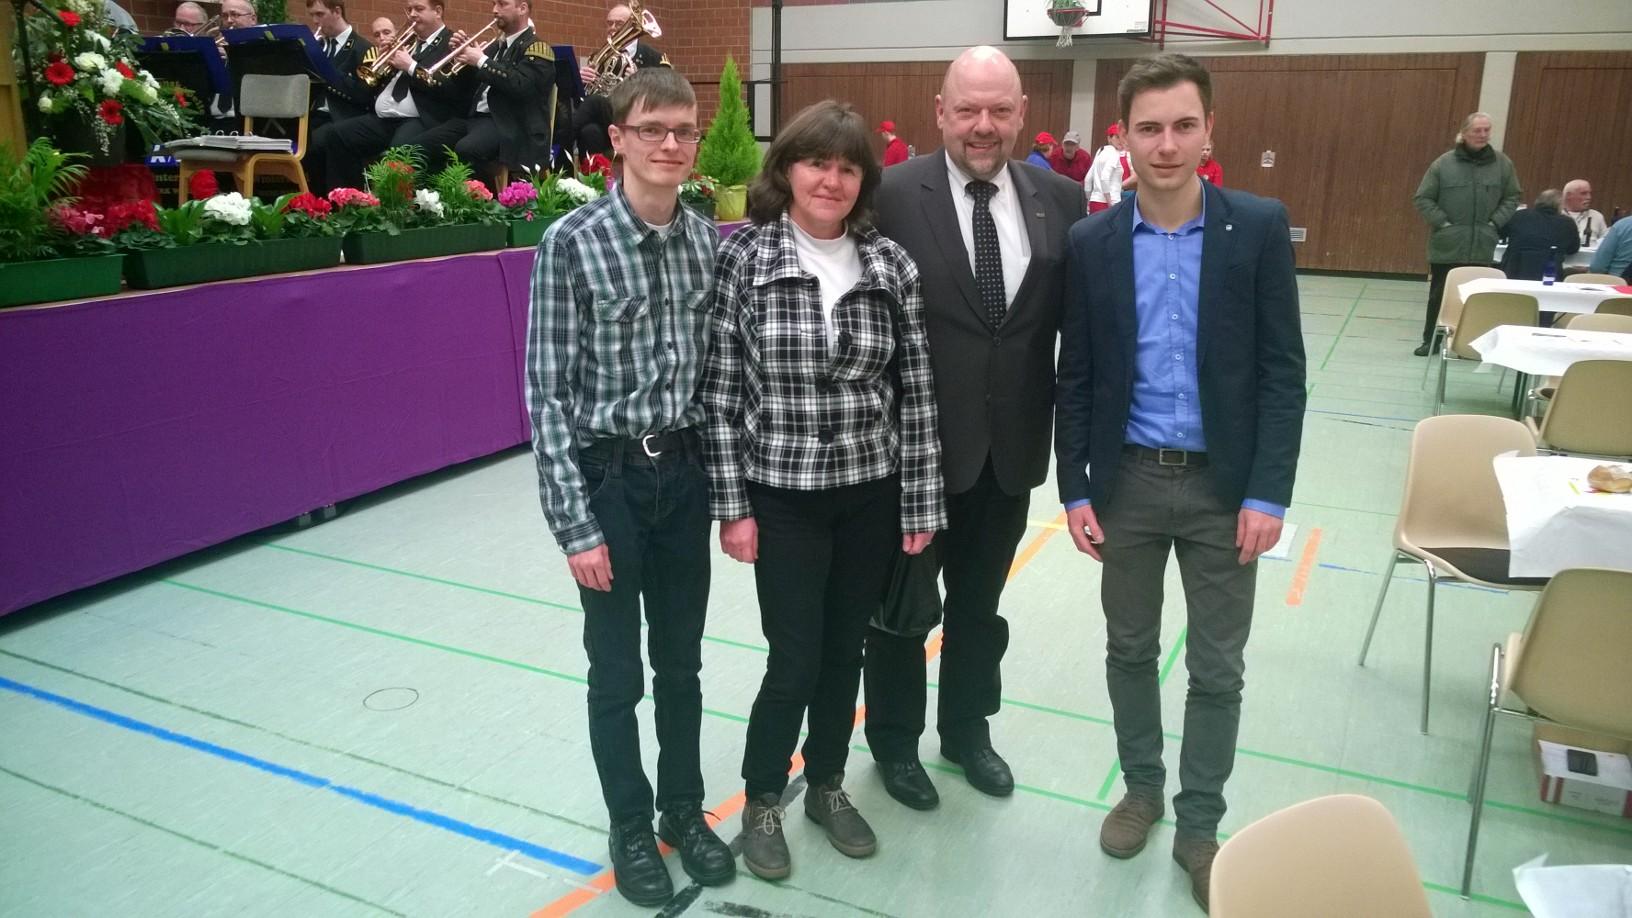 v.l.: Martin Geißler, Karin Richardt, Friedrich Nothhelfer, Maik Klotzbach